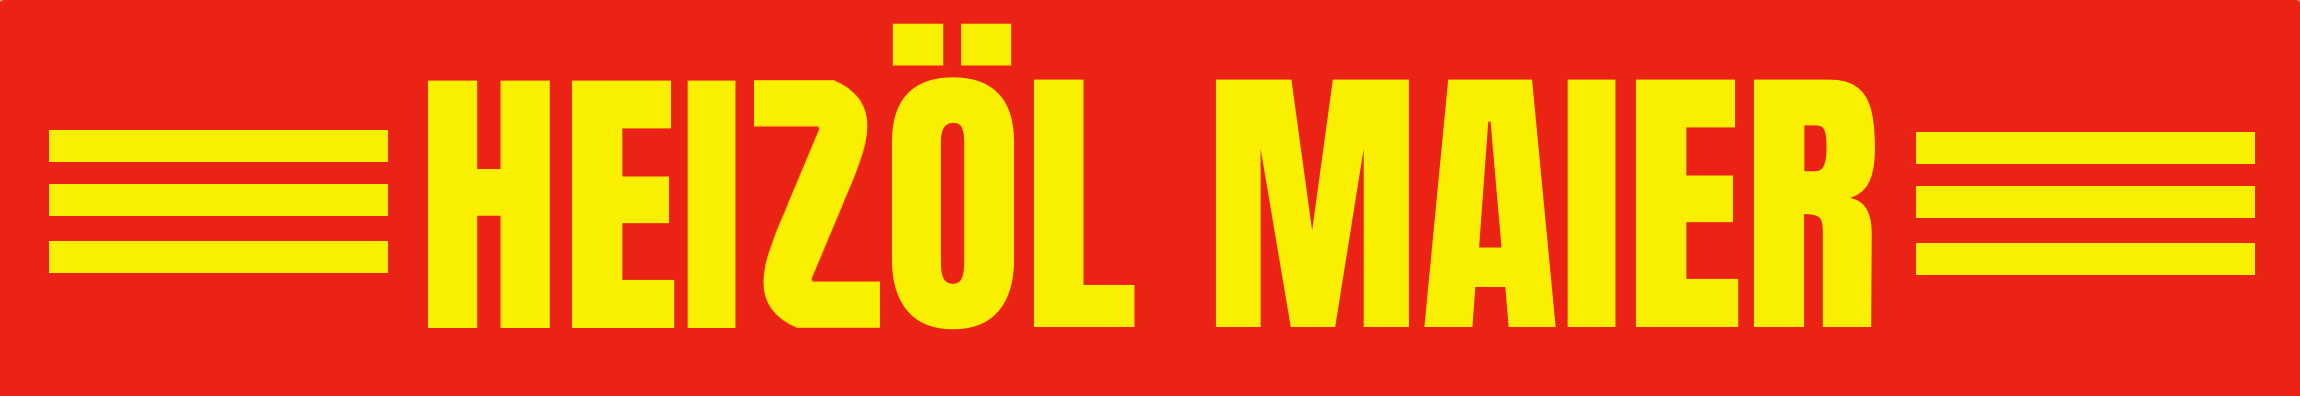 Heizöl Maier - Logo